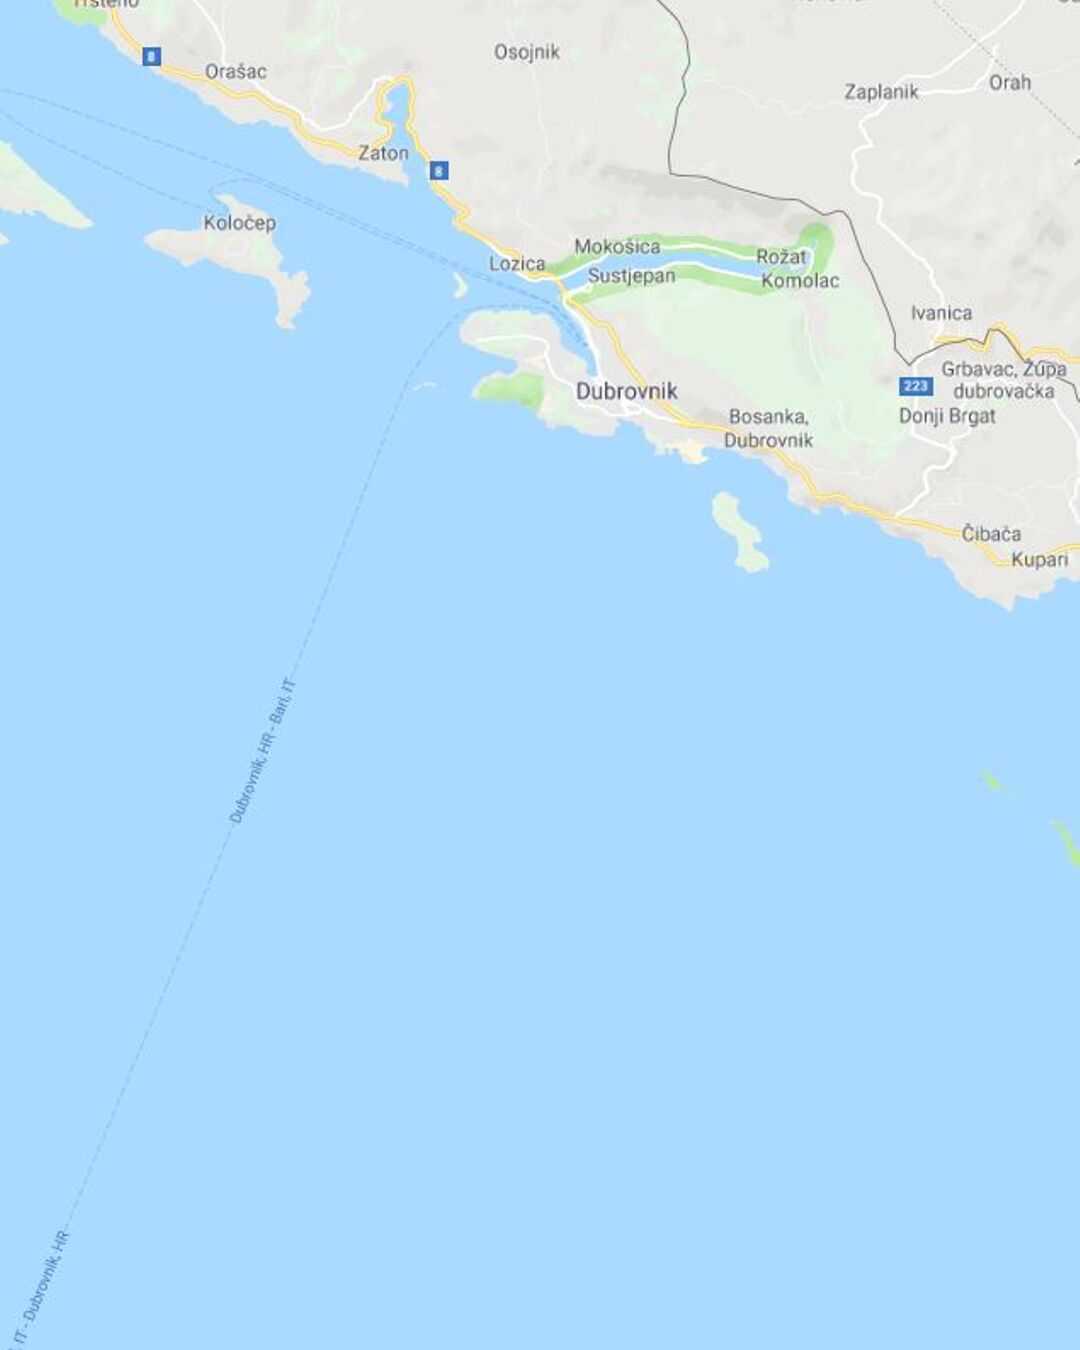 Arrive in Dubrovnik Croatia